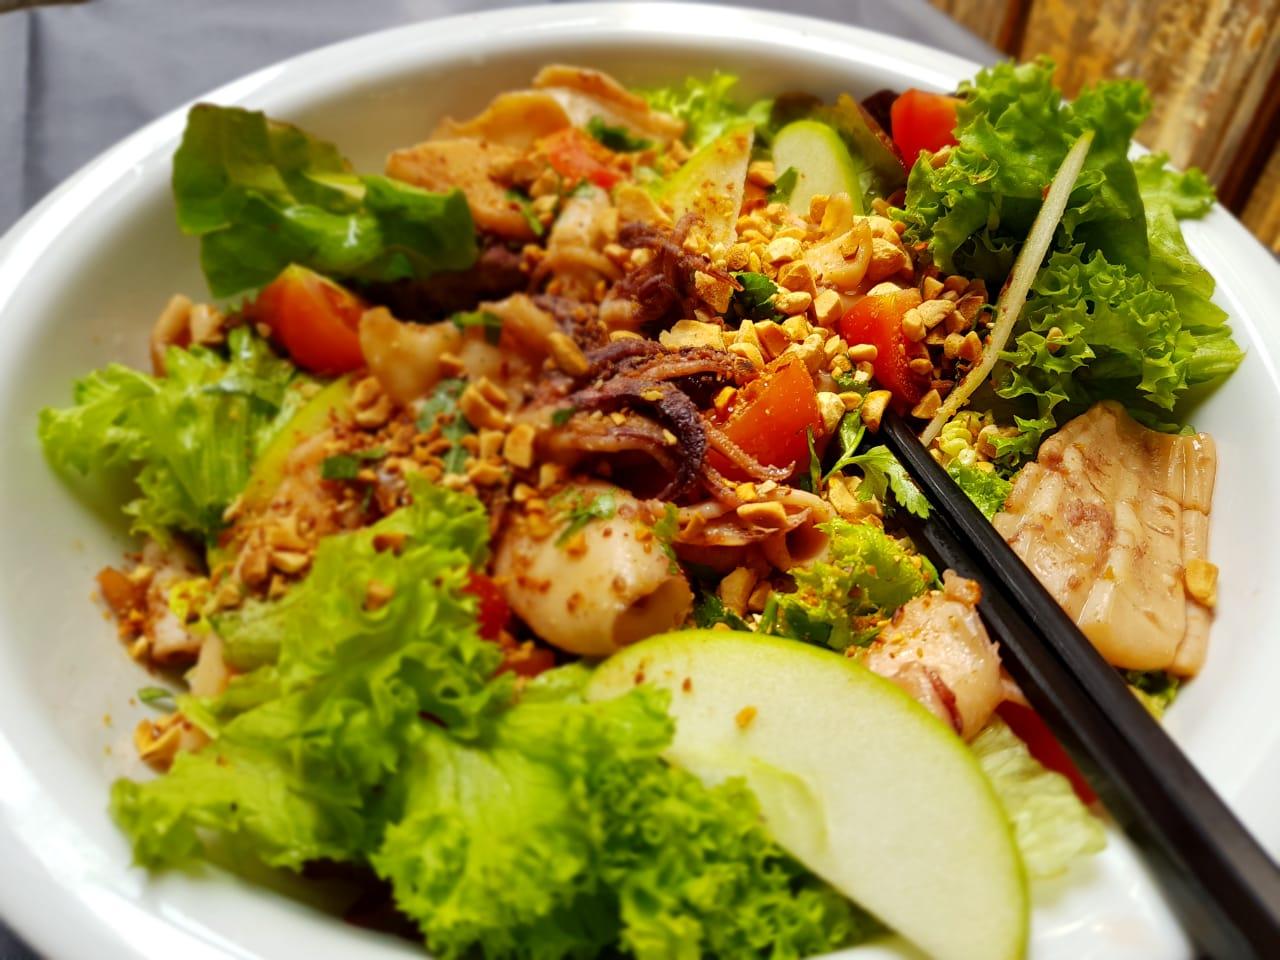 le bistrot viet comida vietnamita barrio lastarria_13